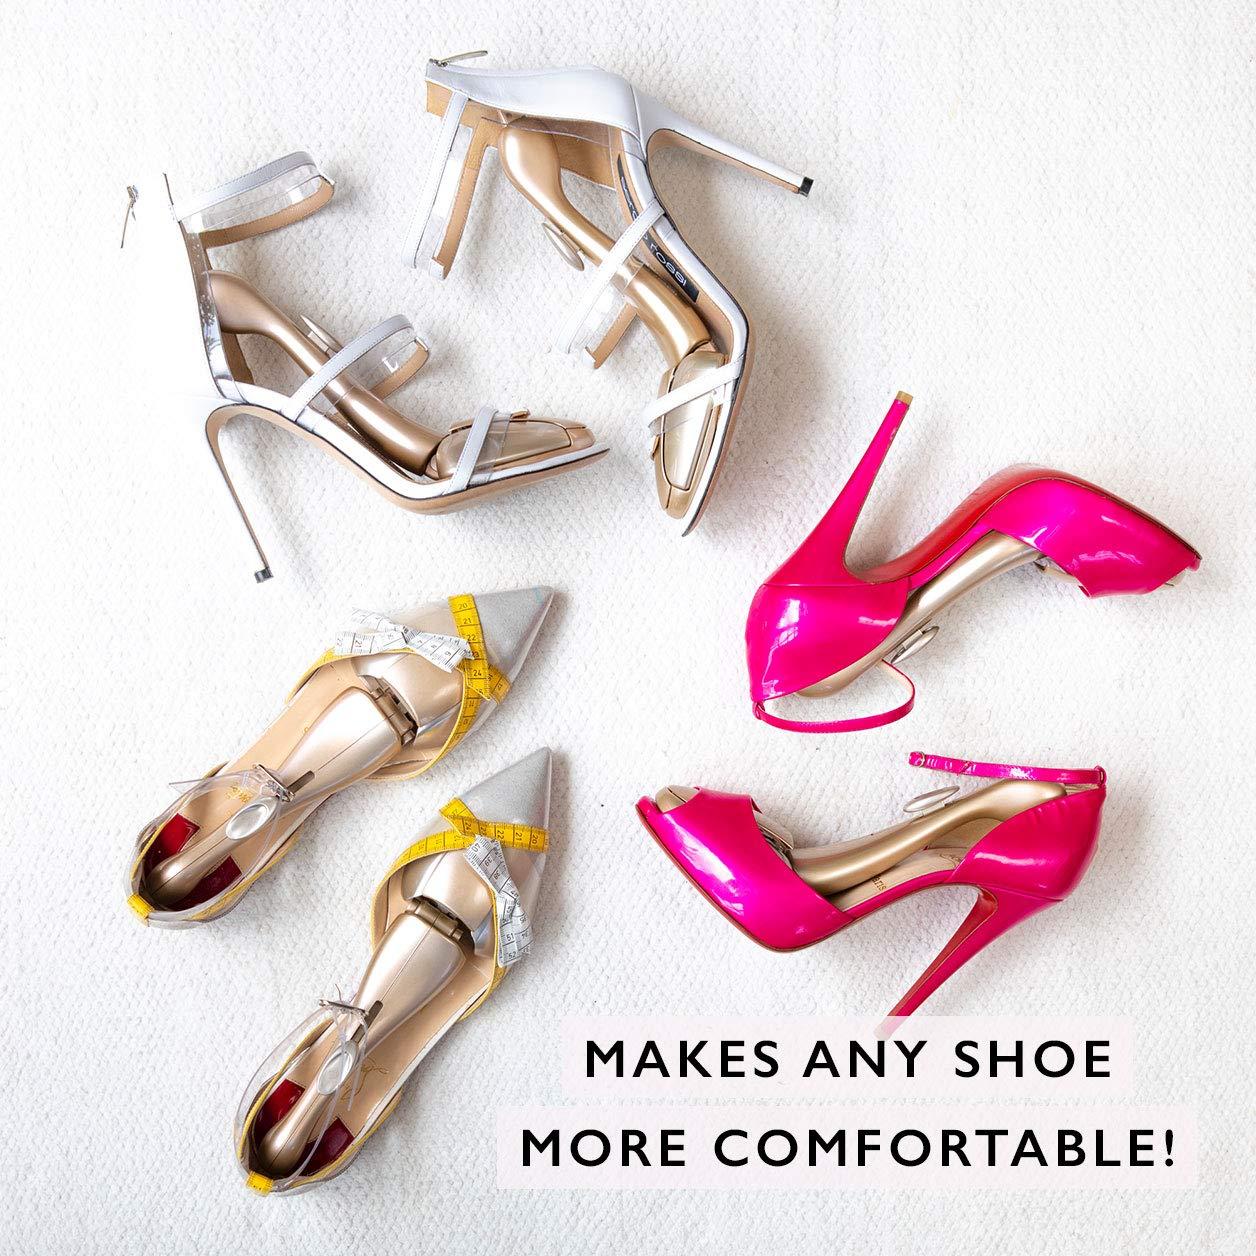 Formé Shoe Shaper Size 1 (6.5-8.5, Metallic Gold)